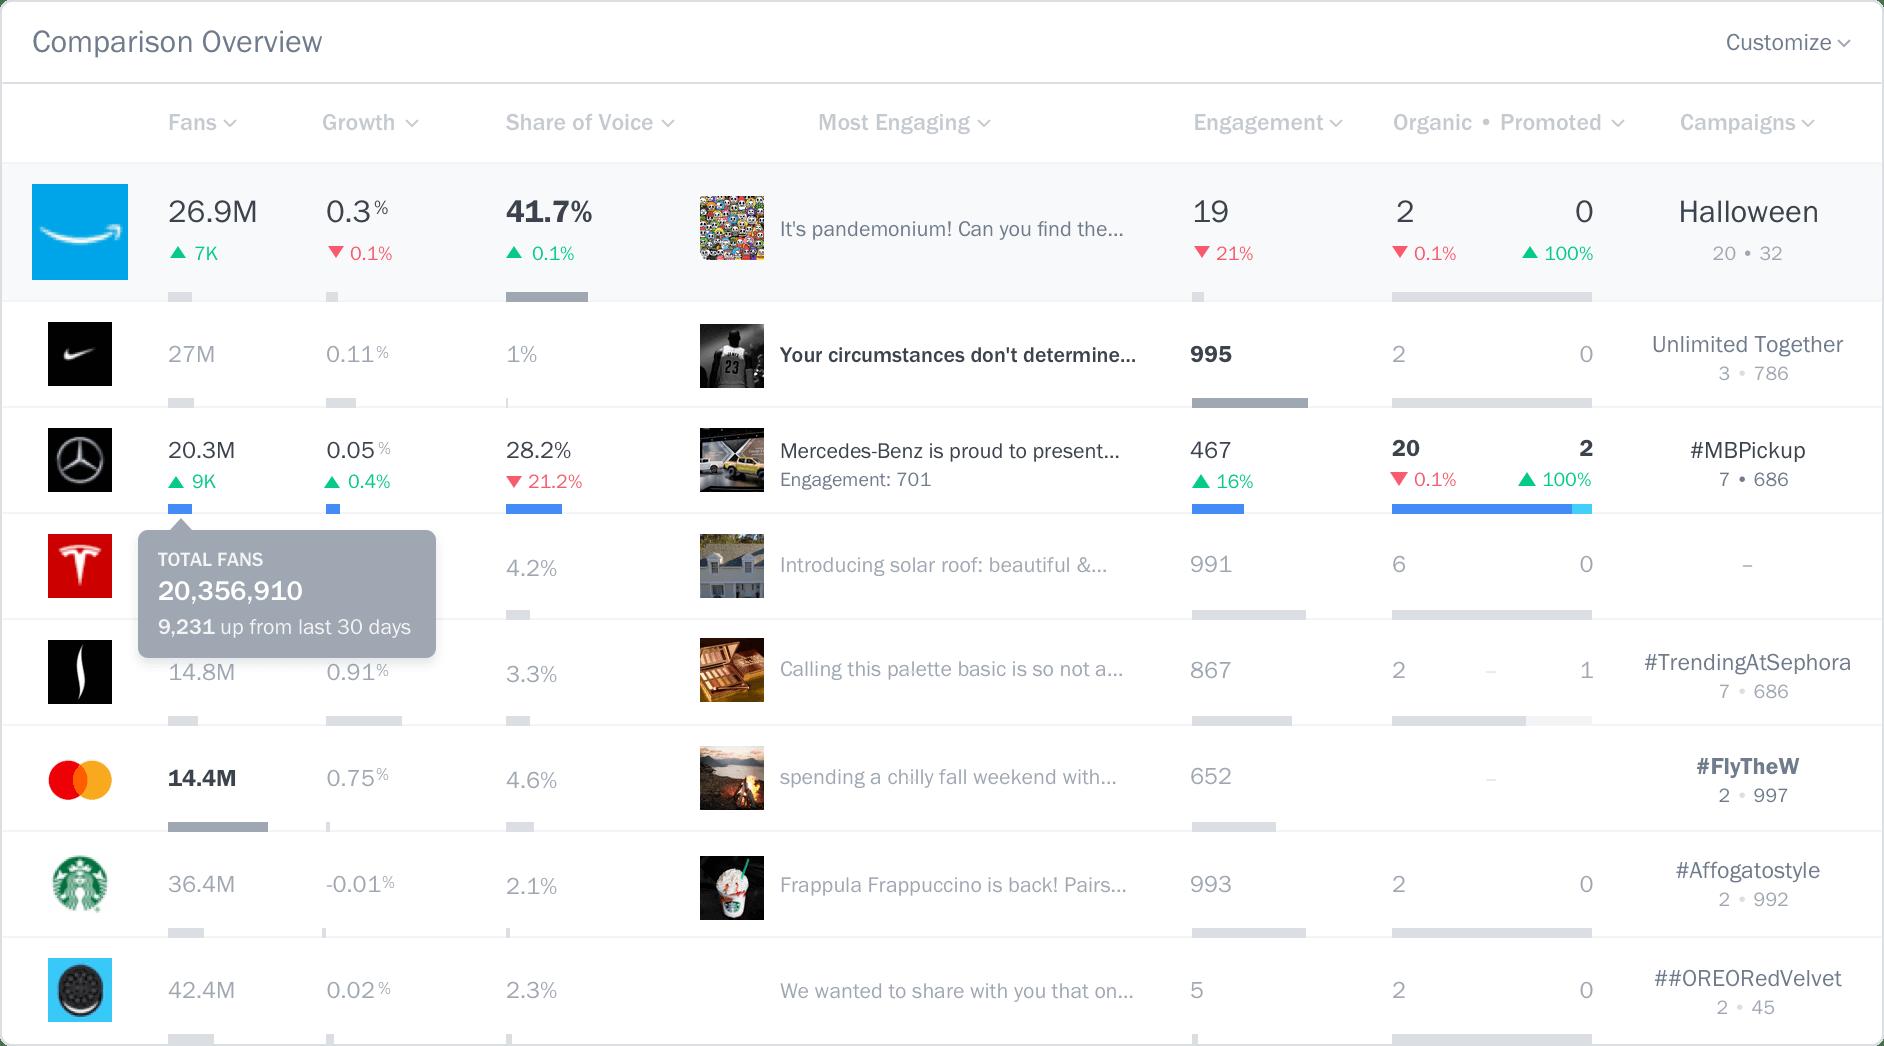 comparison-overview